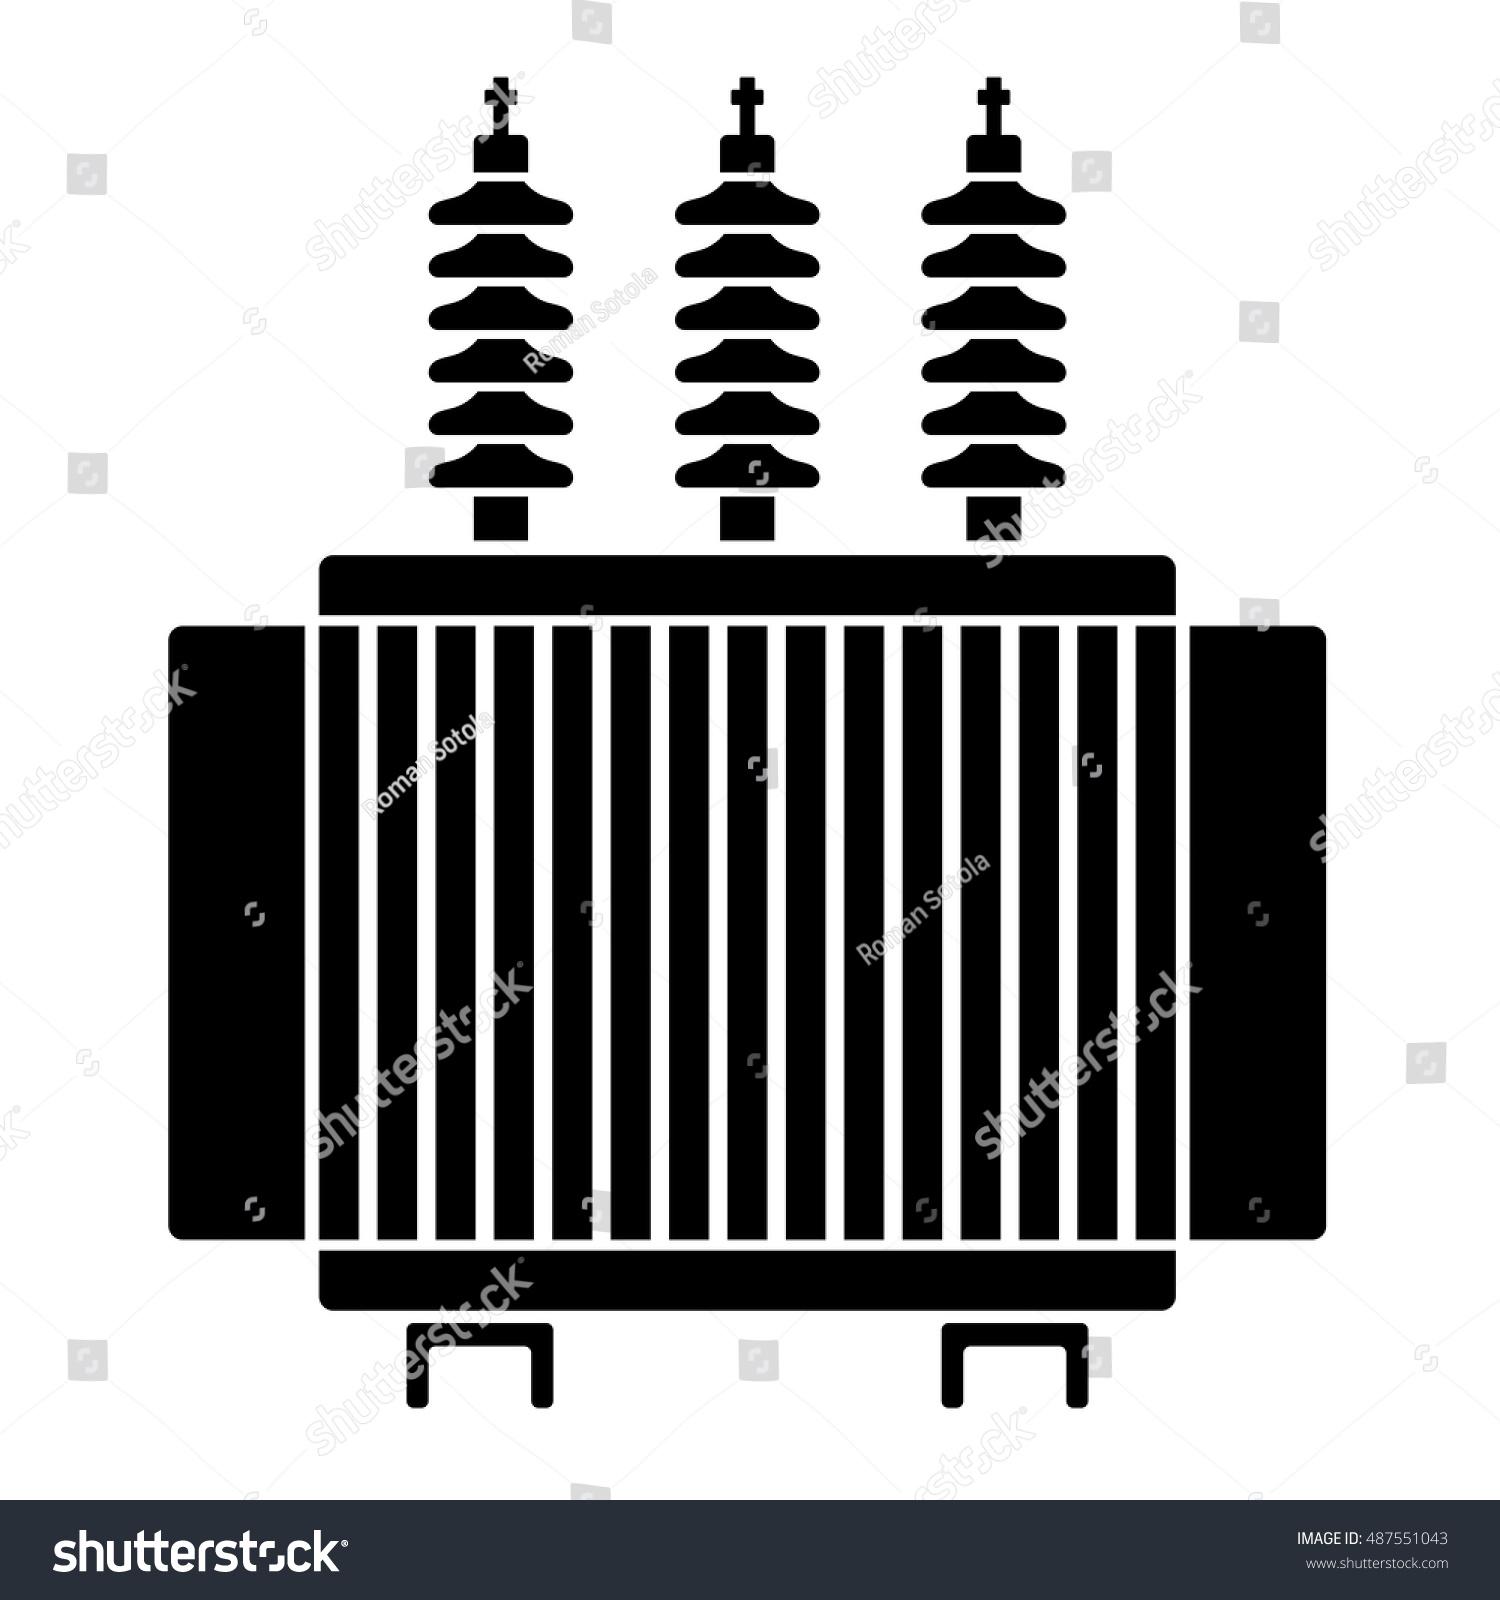 High Voltage Electrical Transformer Black Symbol Stock Vector ...